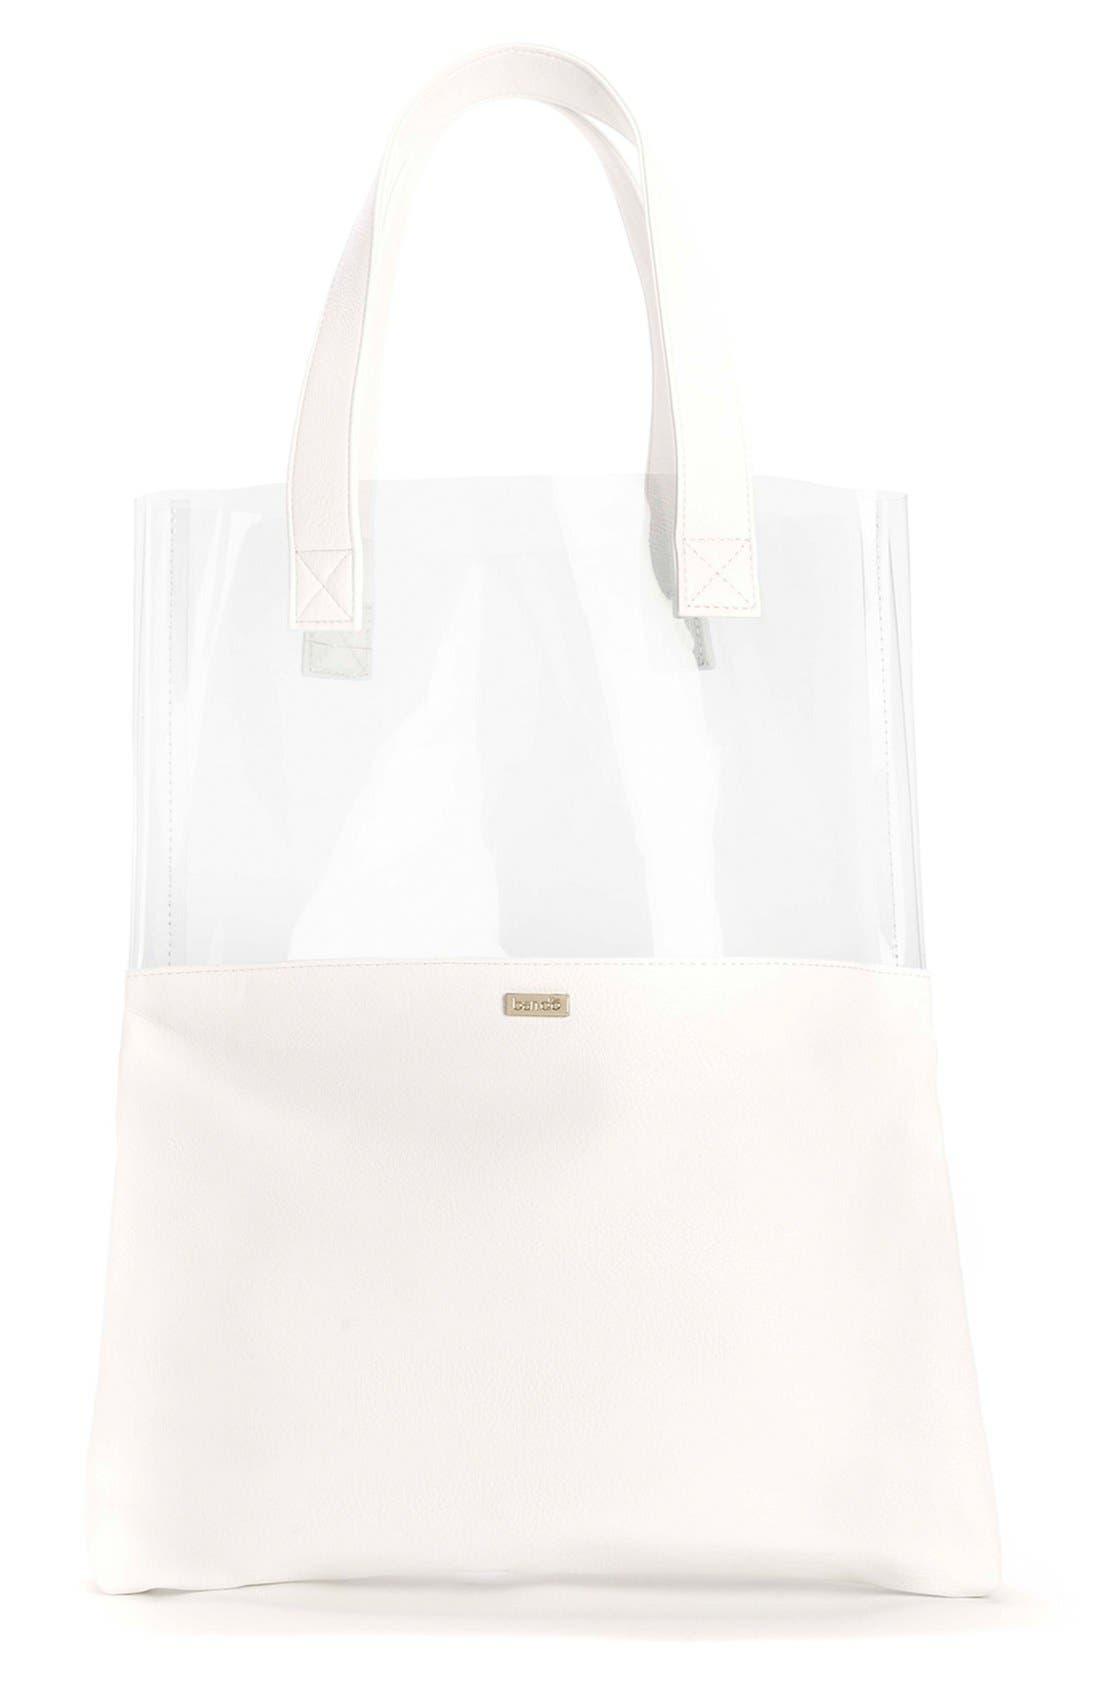 BAN.DO 'Peekaboo' Tote Bag, Main, color, 100